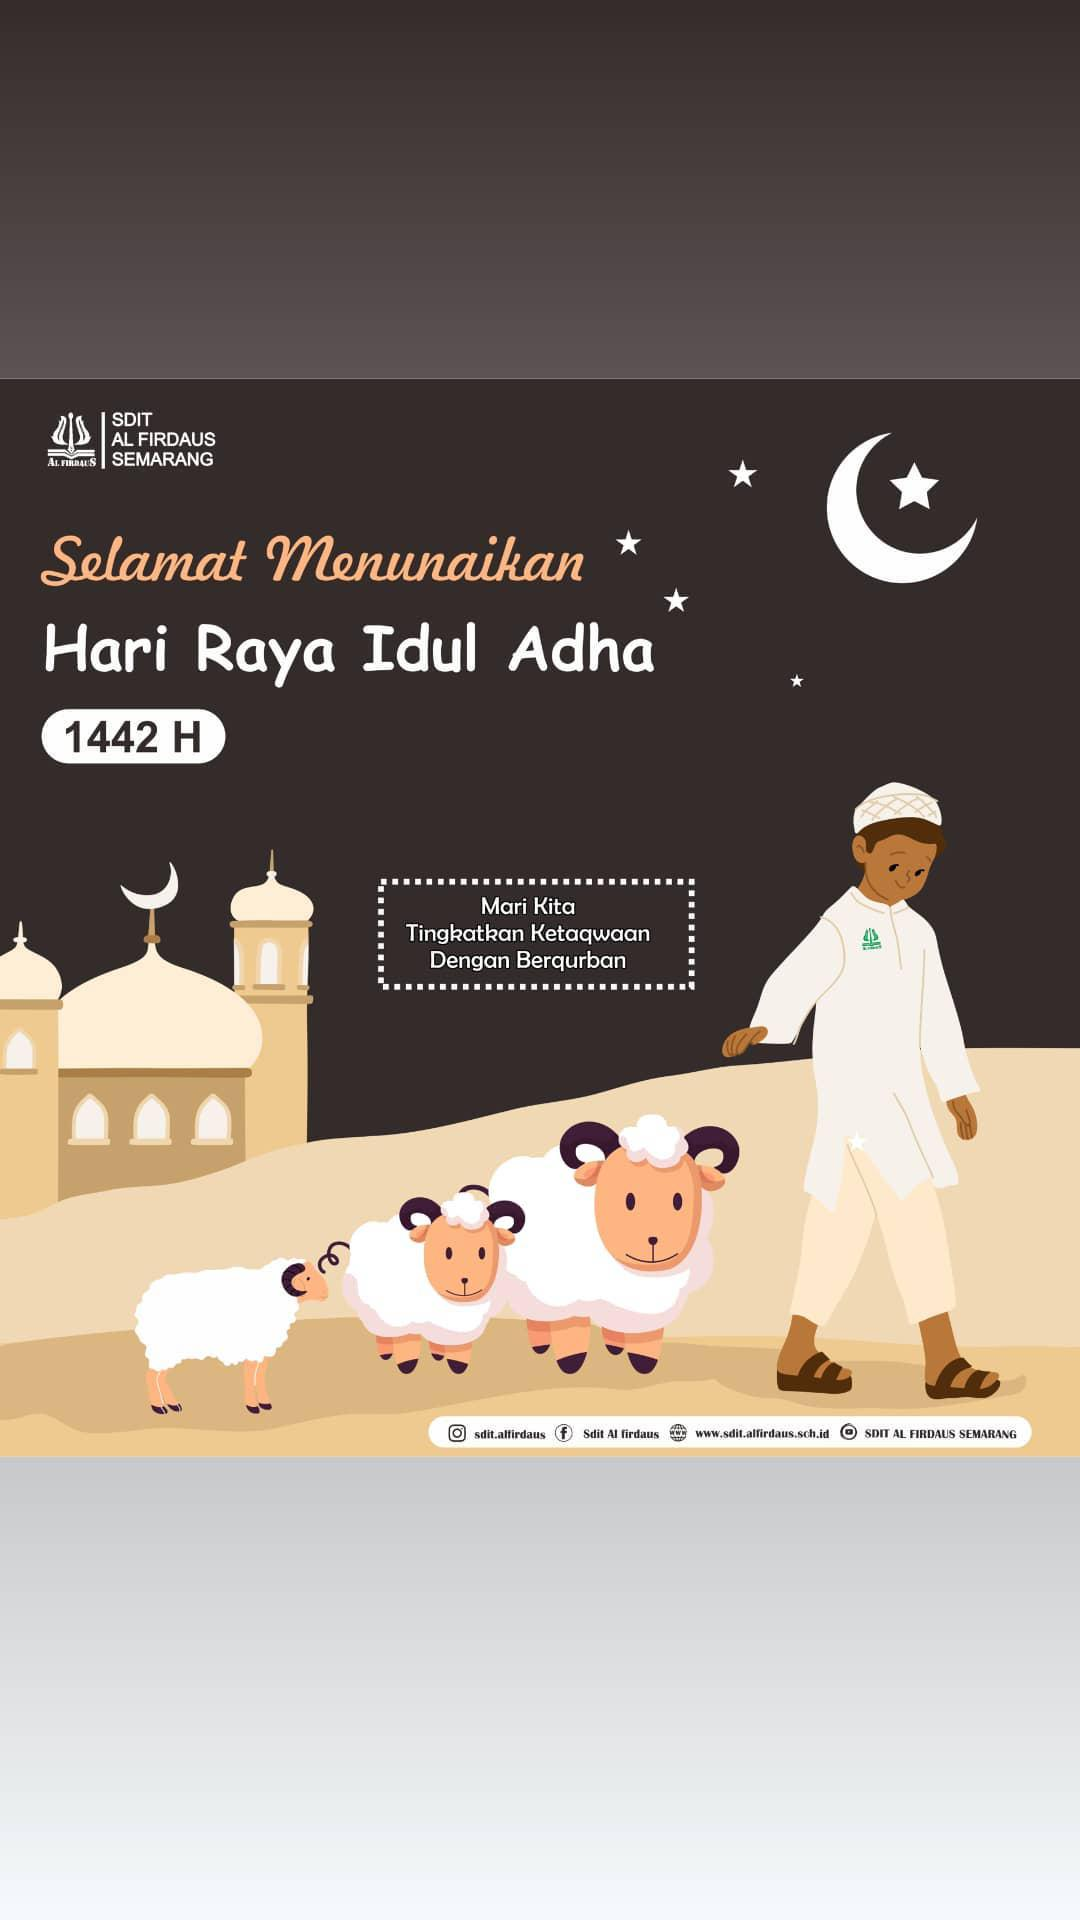 MENYAMBUT HARI RAYA IDUL ADHA 1442 H